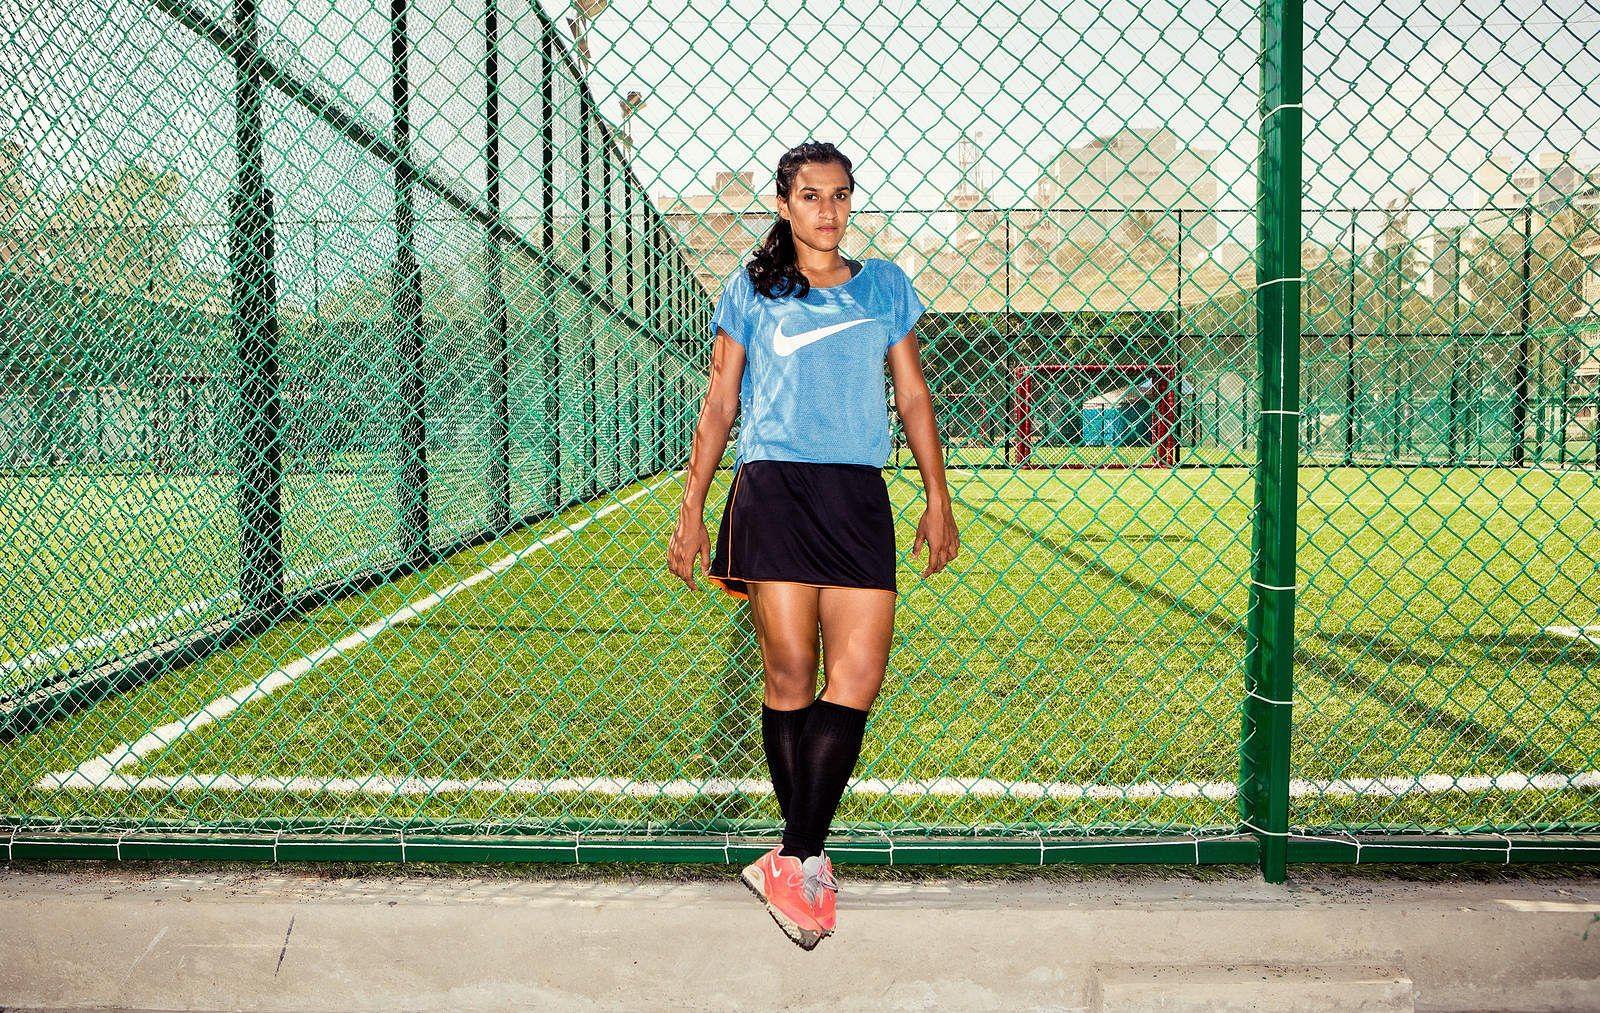 india-female-athletes-nike-video-body-rani_rampal.jpg__1600x1013_q85_crop_subsampling-2_upscale